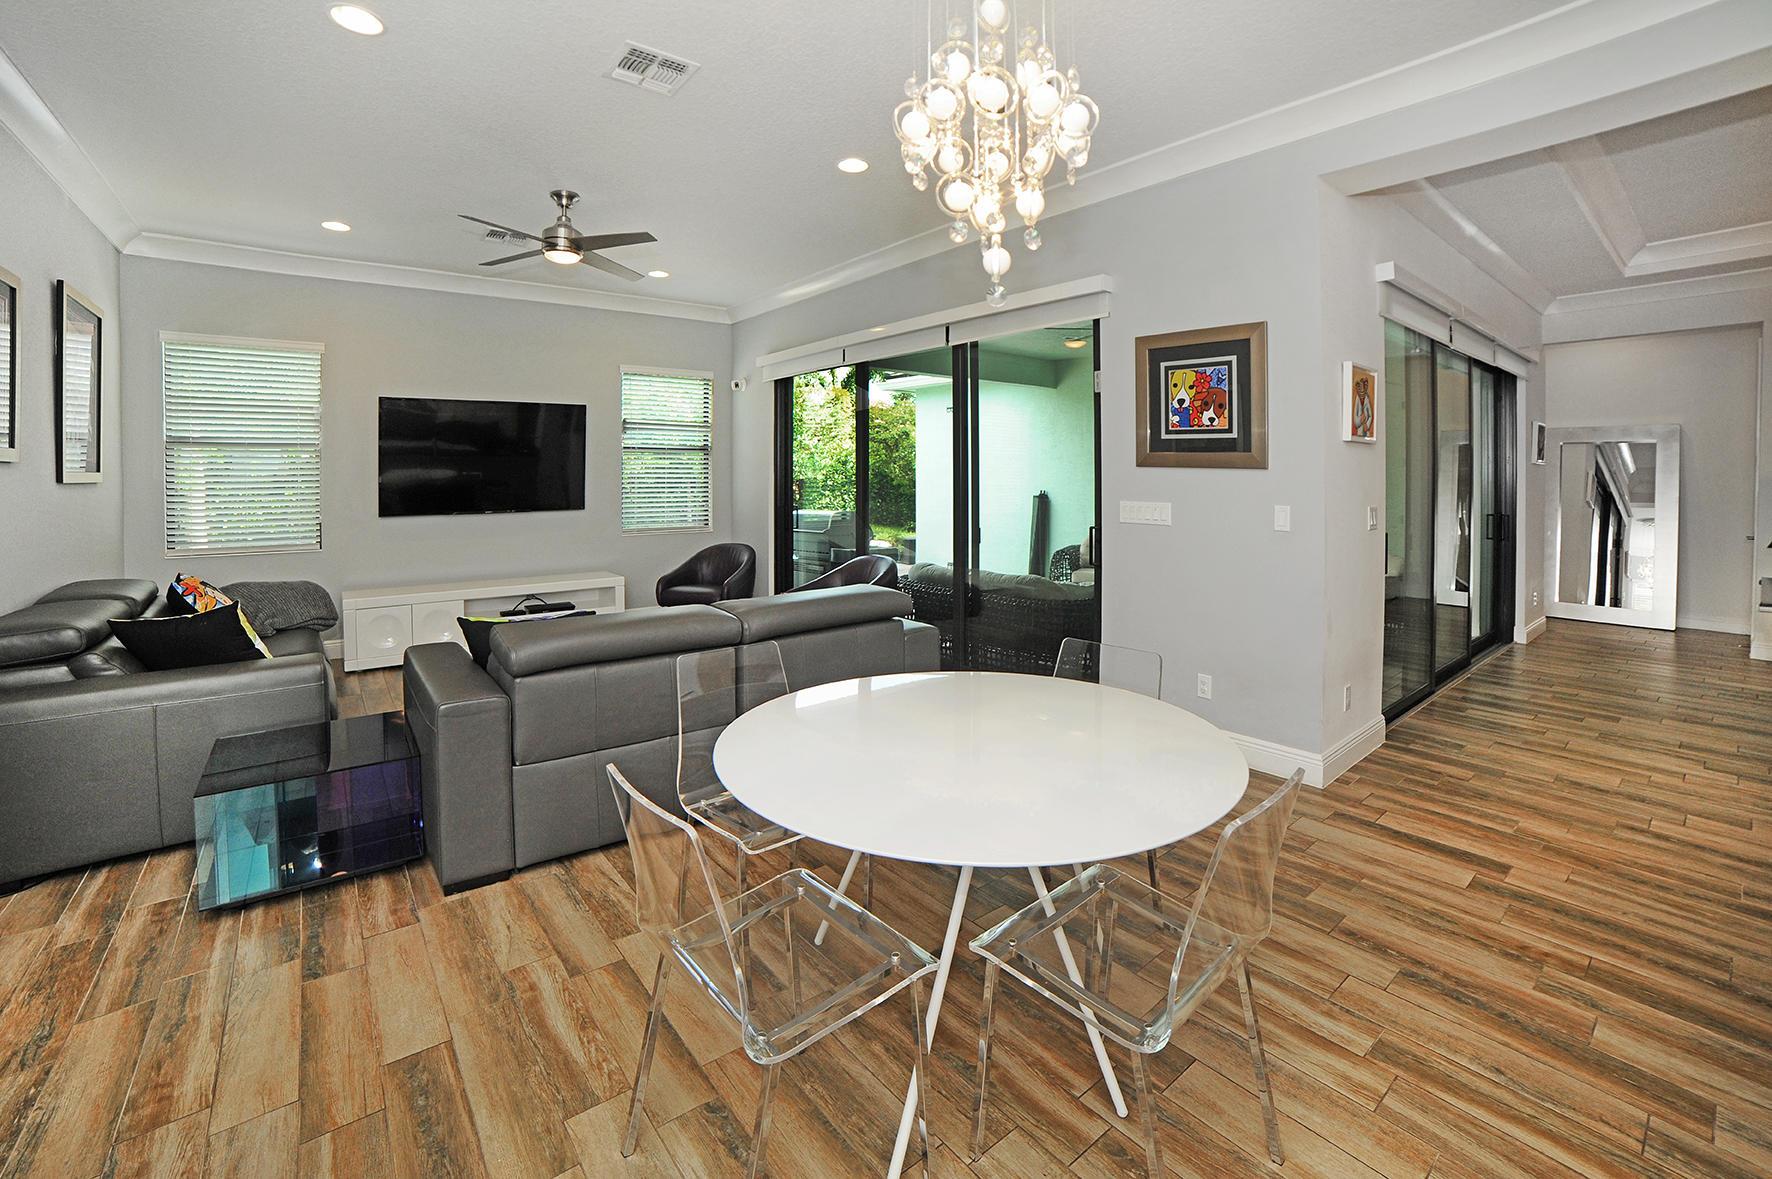 12234 Boca Reserve Lane, Boca Raton, Florida 33428, 4 Bedrooms Bedrooms, ,3 BathroomsBathrooms,A,Single family,Boca Reserve,RX-10359810